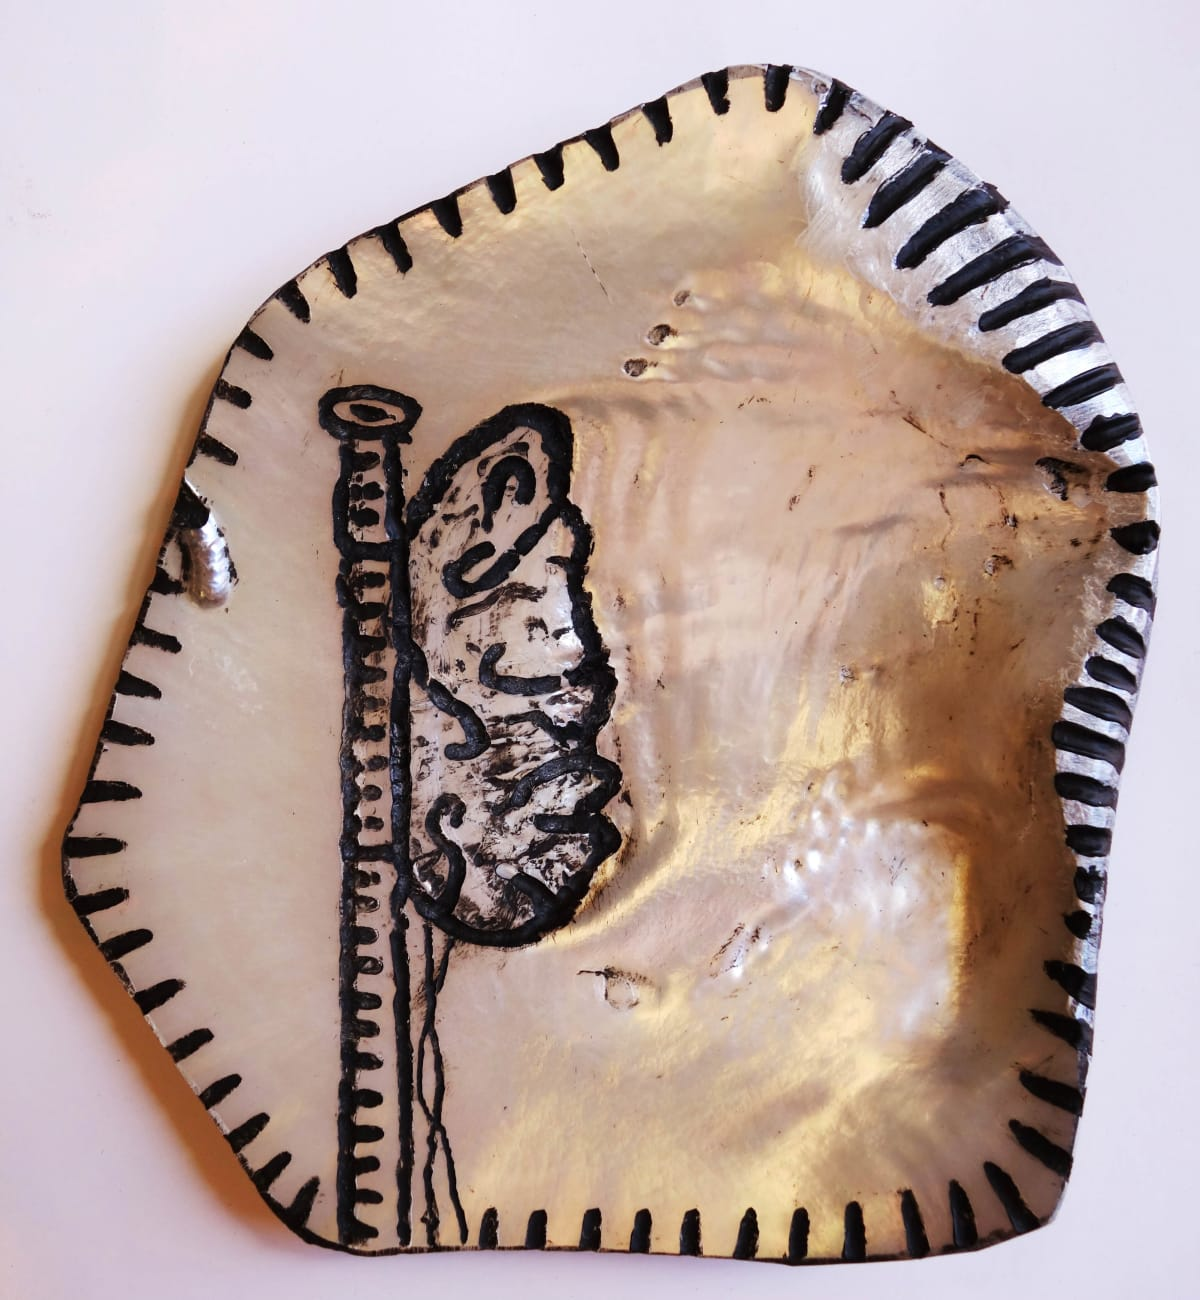 Stephen Eastaugh SHELL-2, 2015 Pearl shell and acrylic